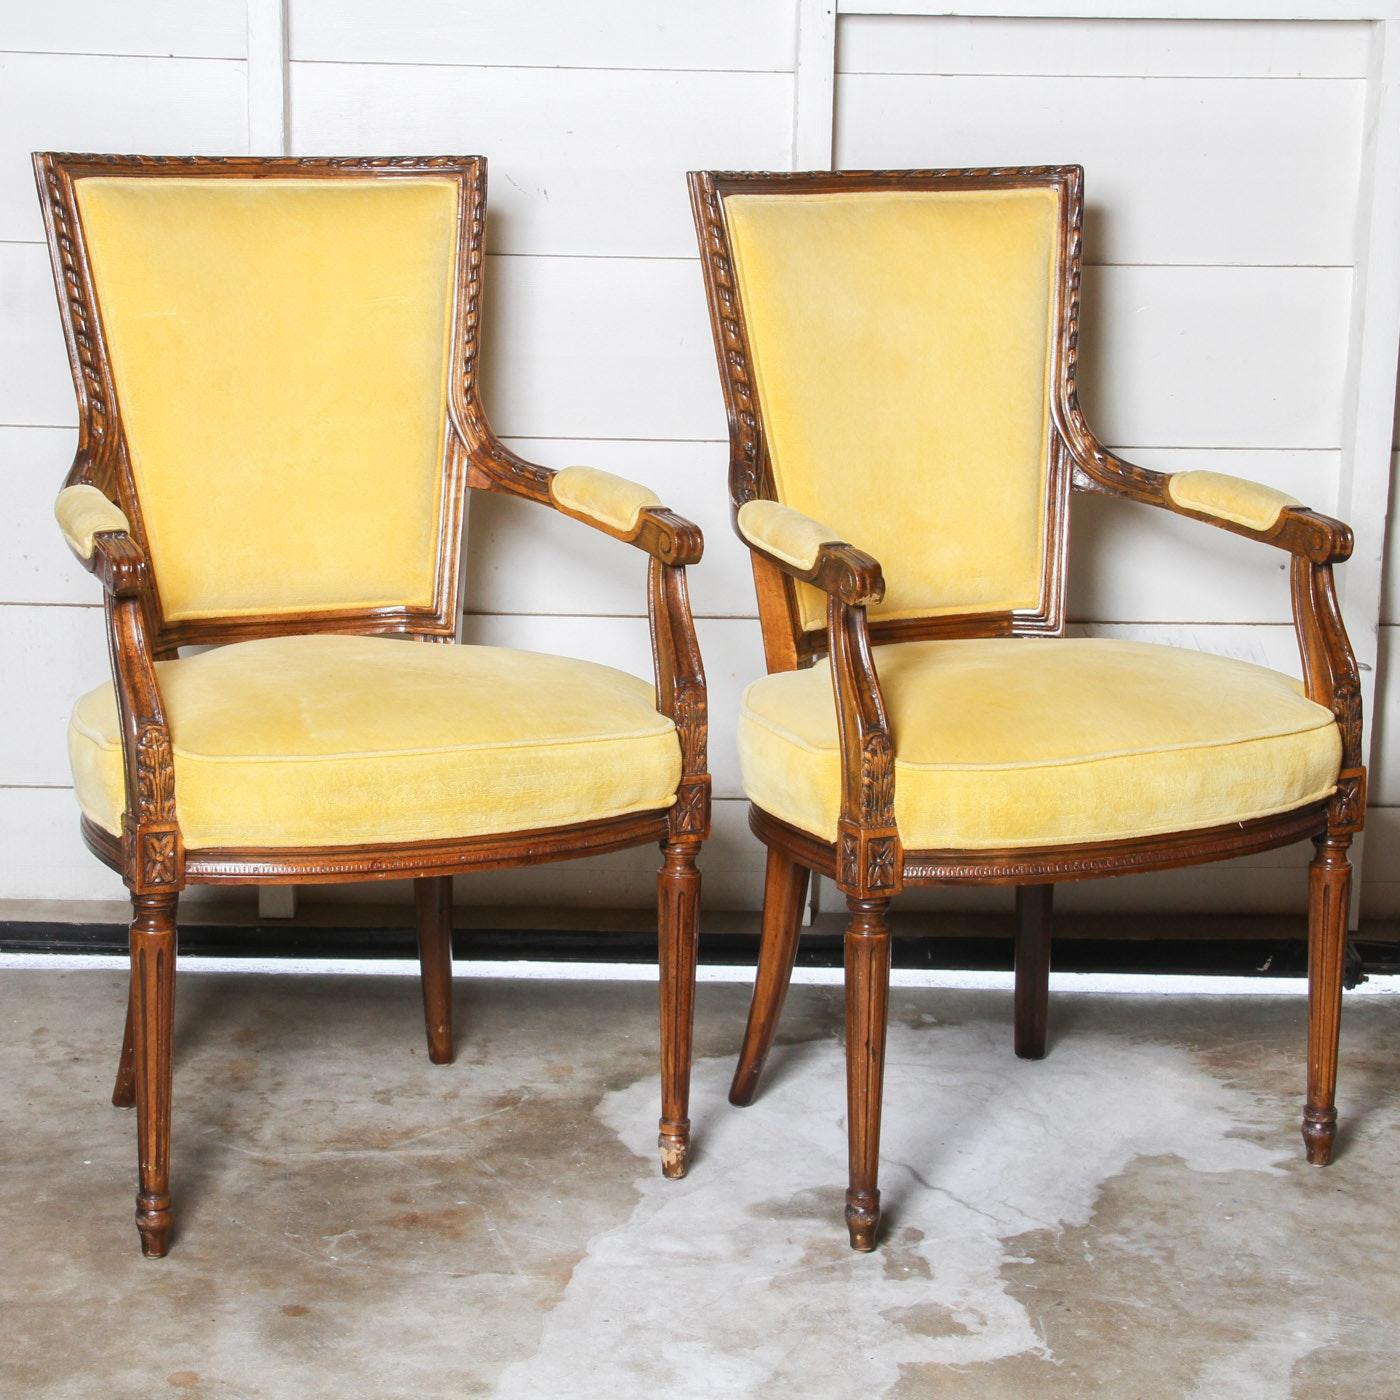 Pair of Sheraton Style Armchairs